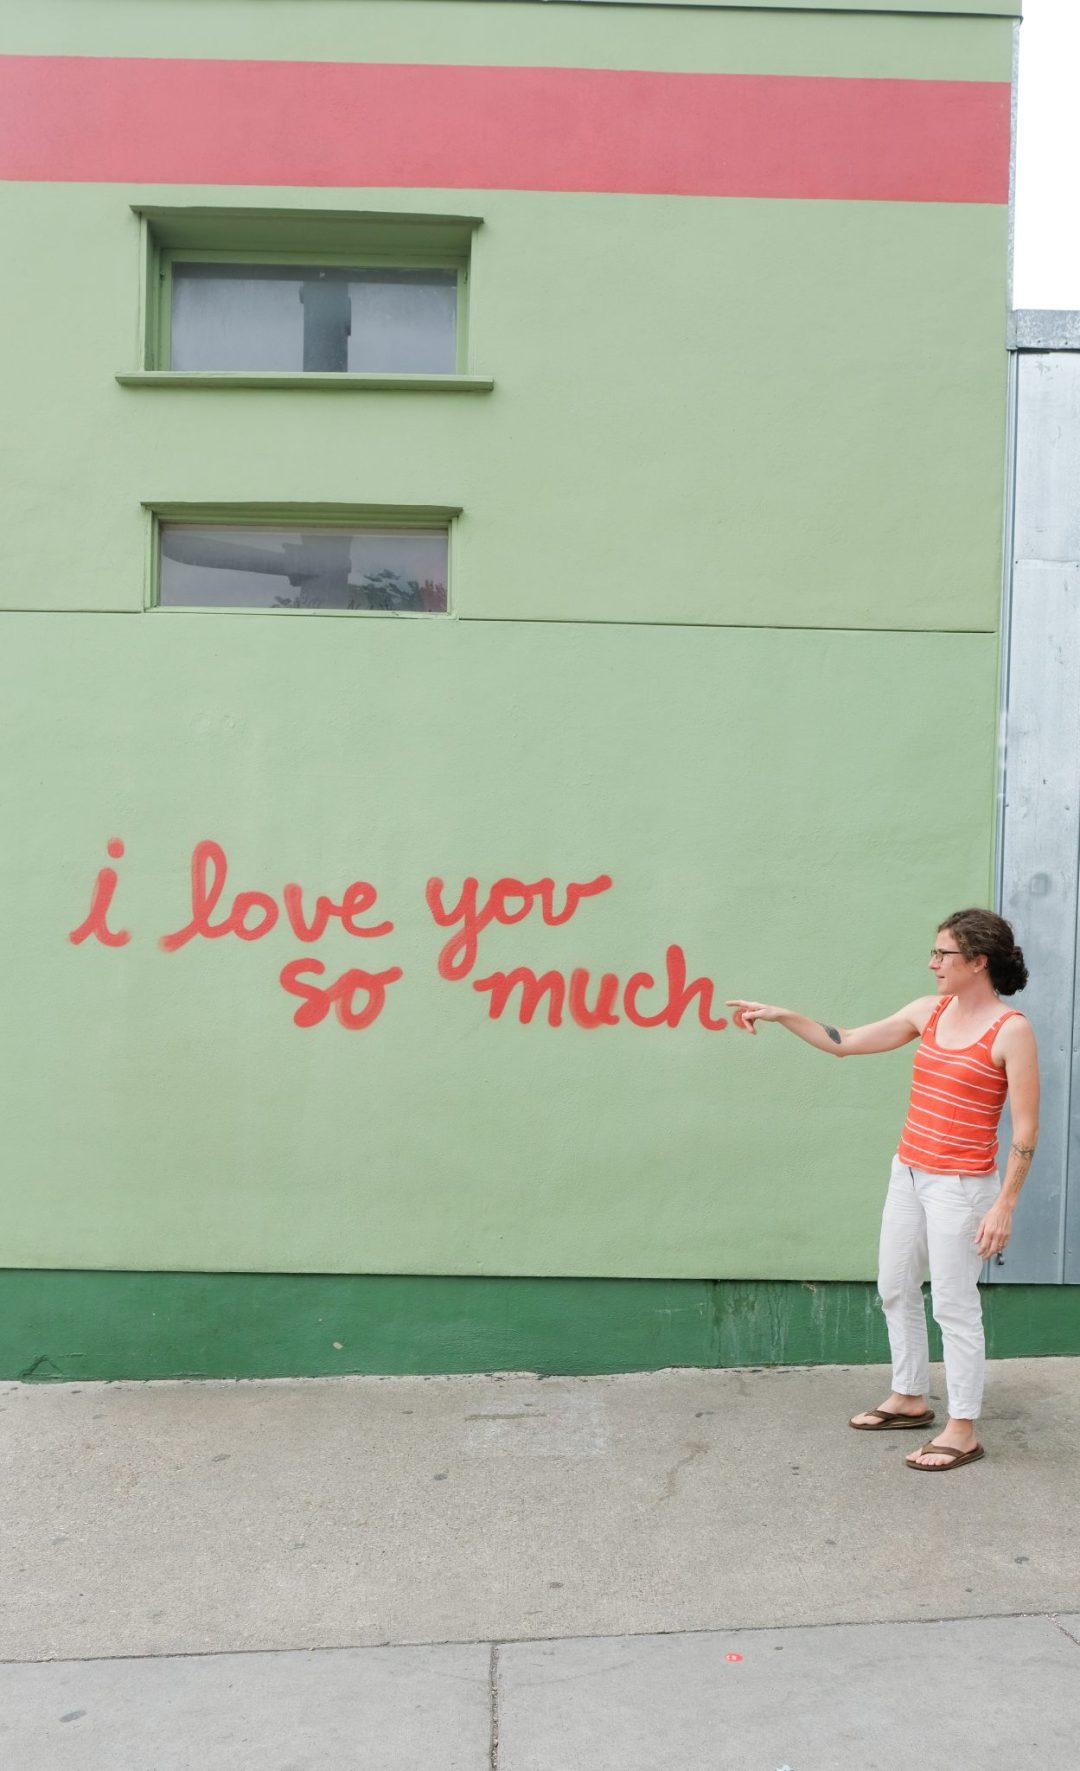 Jo's Coffee Mural in Austin, Texas